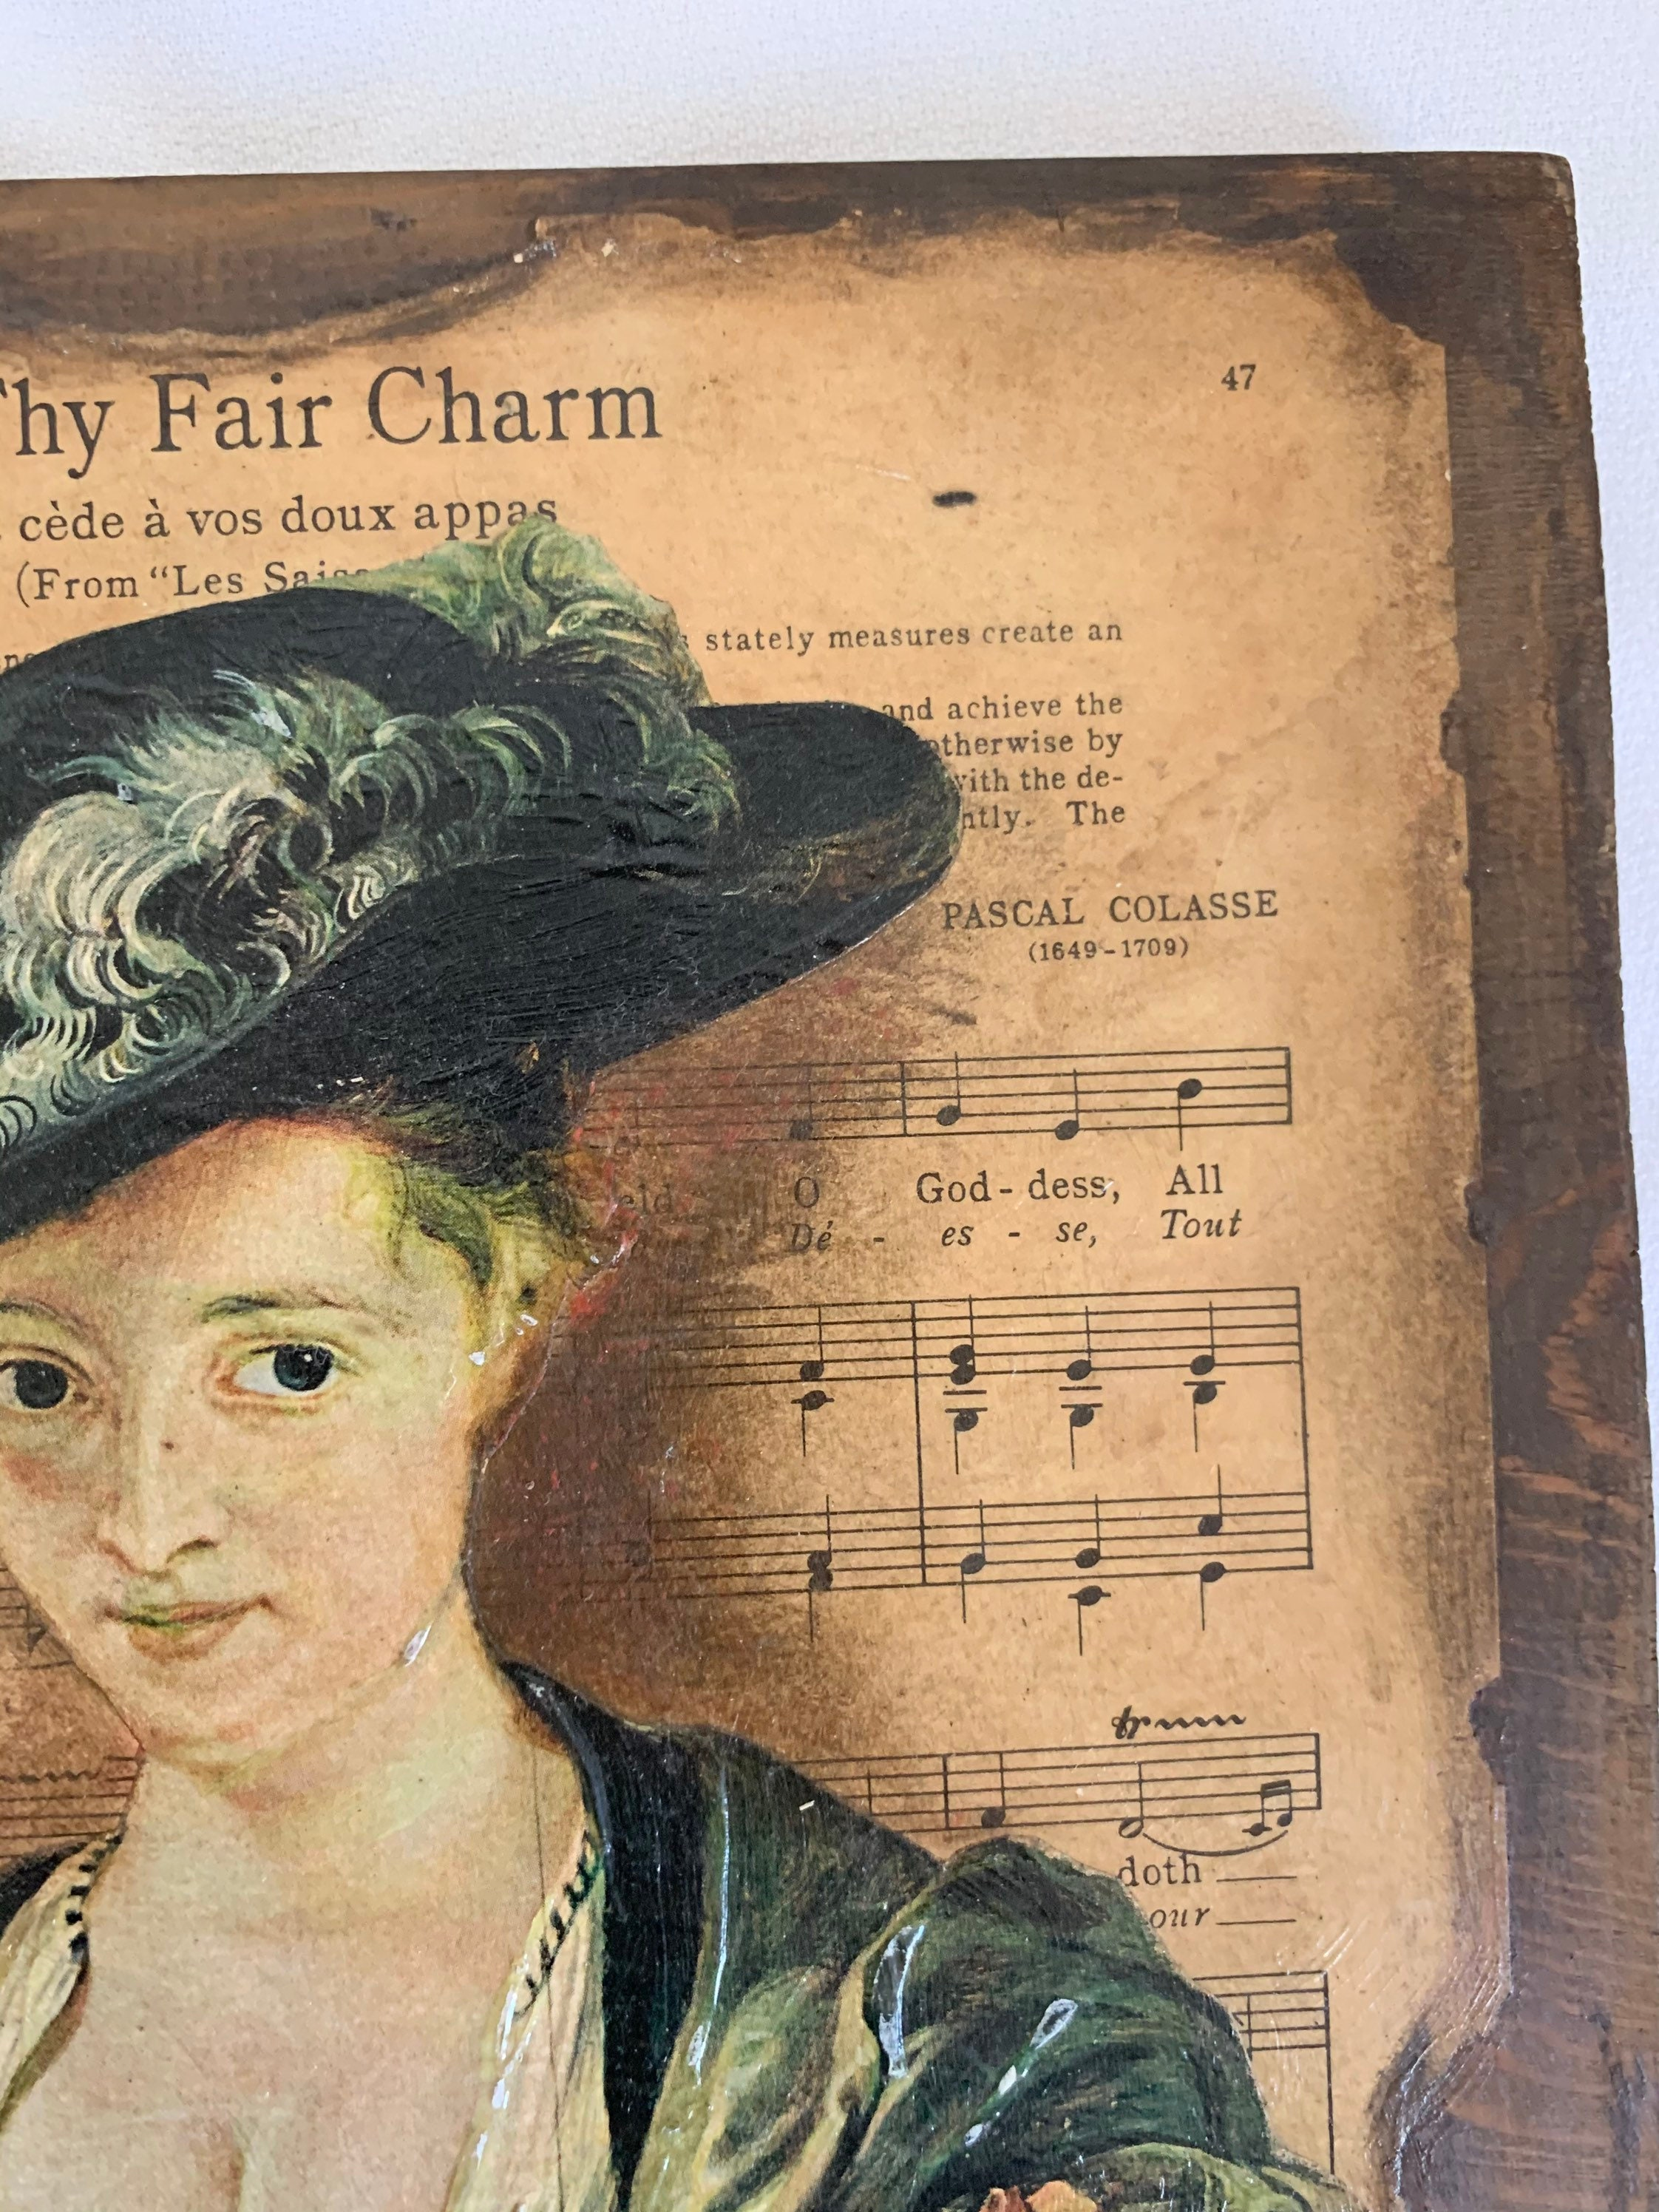 Pin by Oi Ling Wong on O Ladybug S1   Winter hats, Crochet hats, Crochet